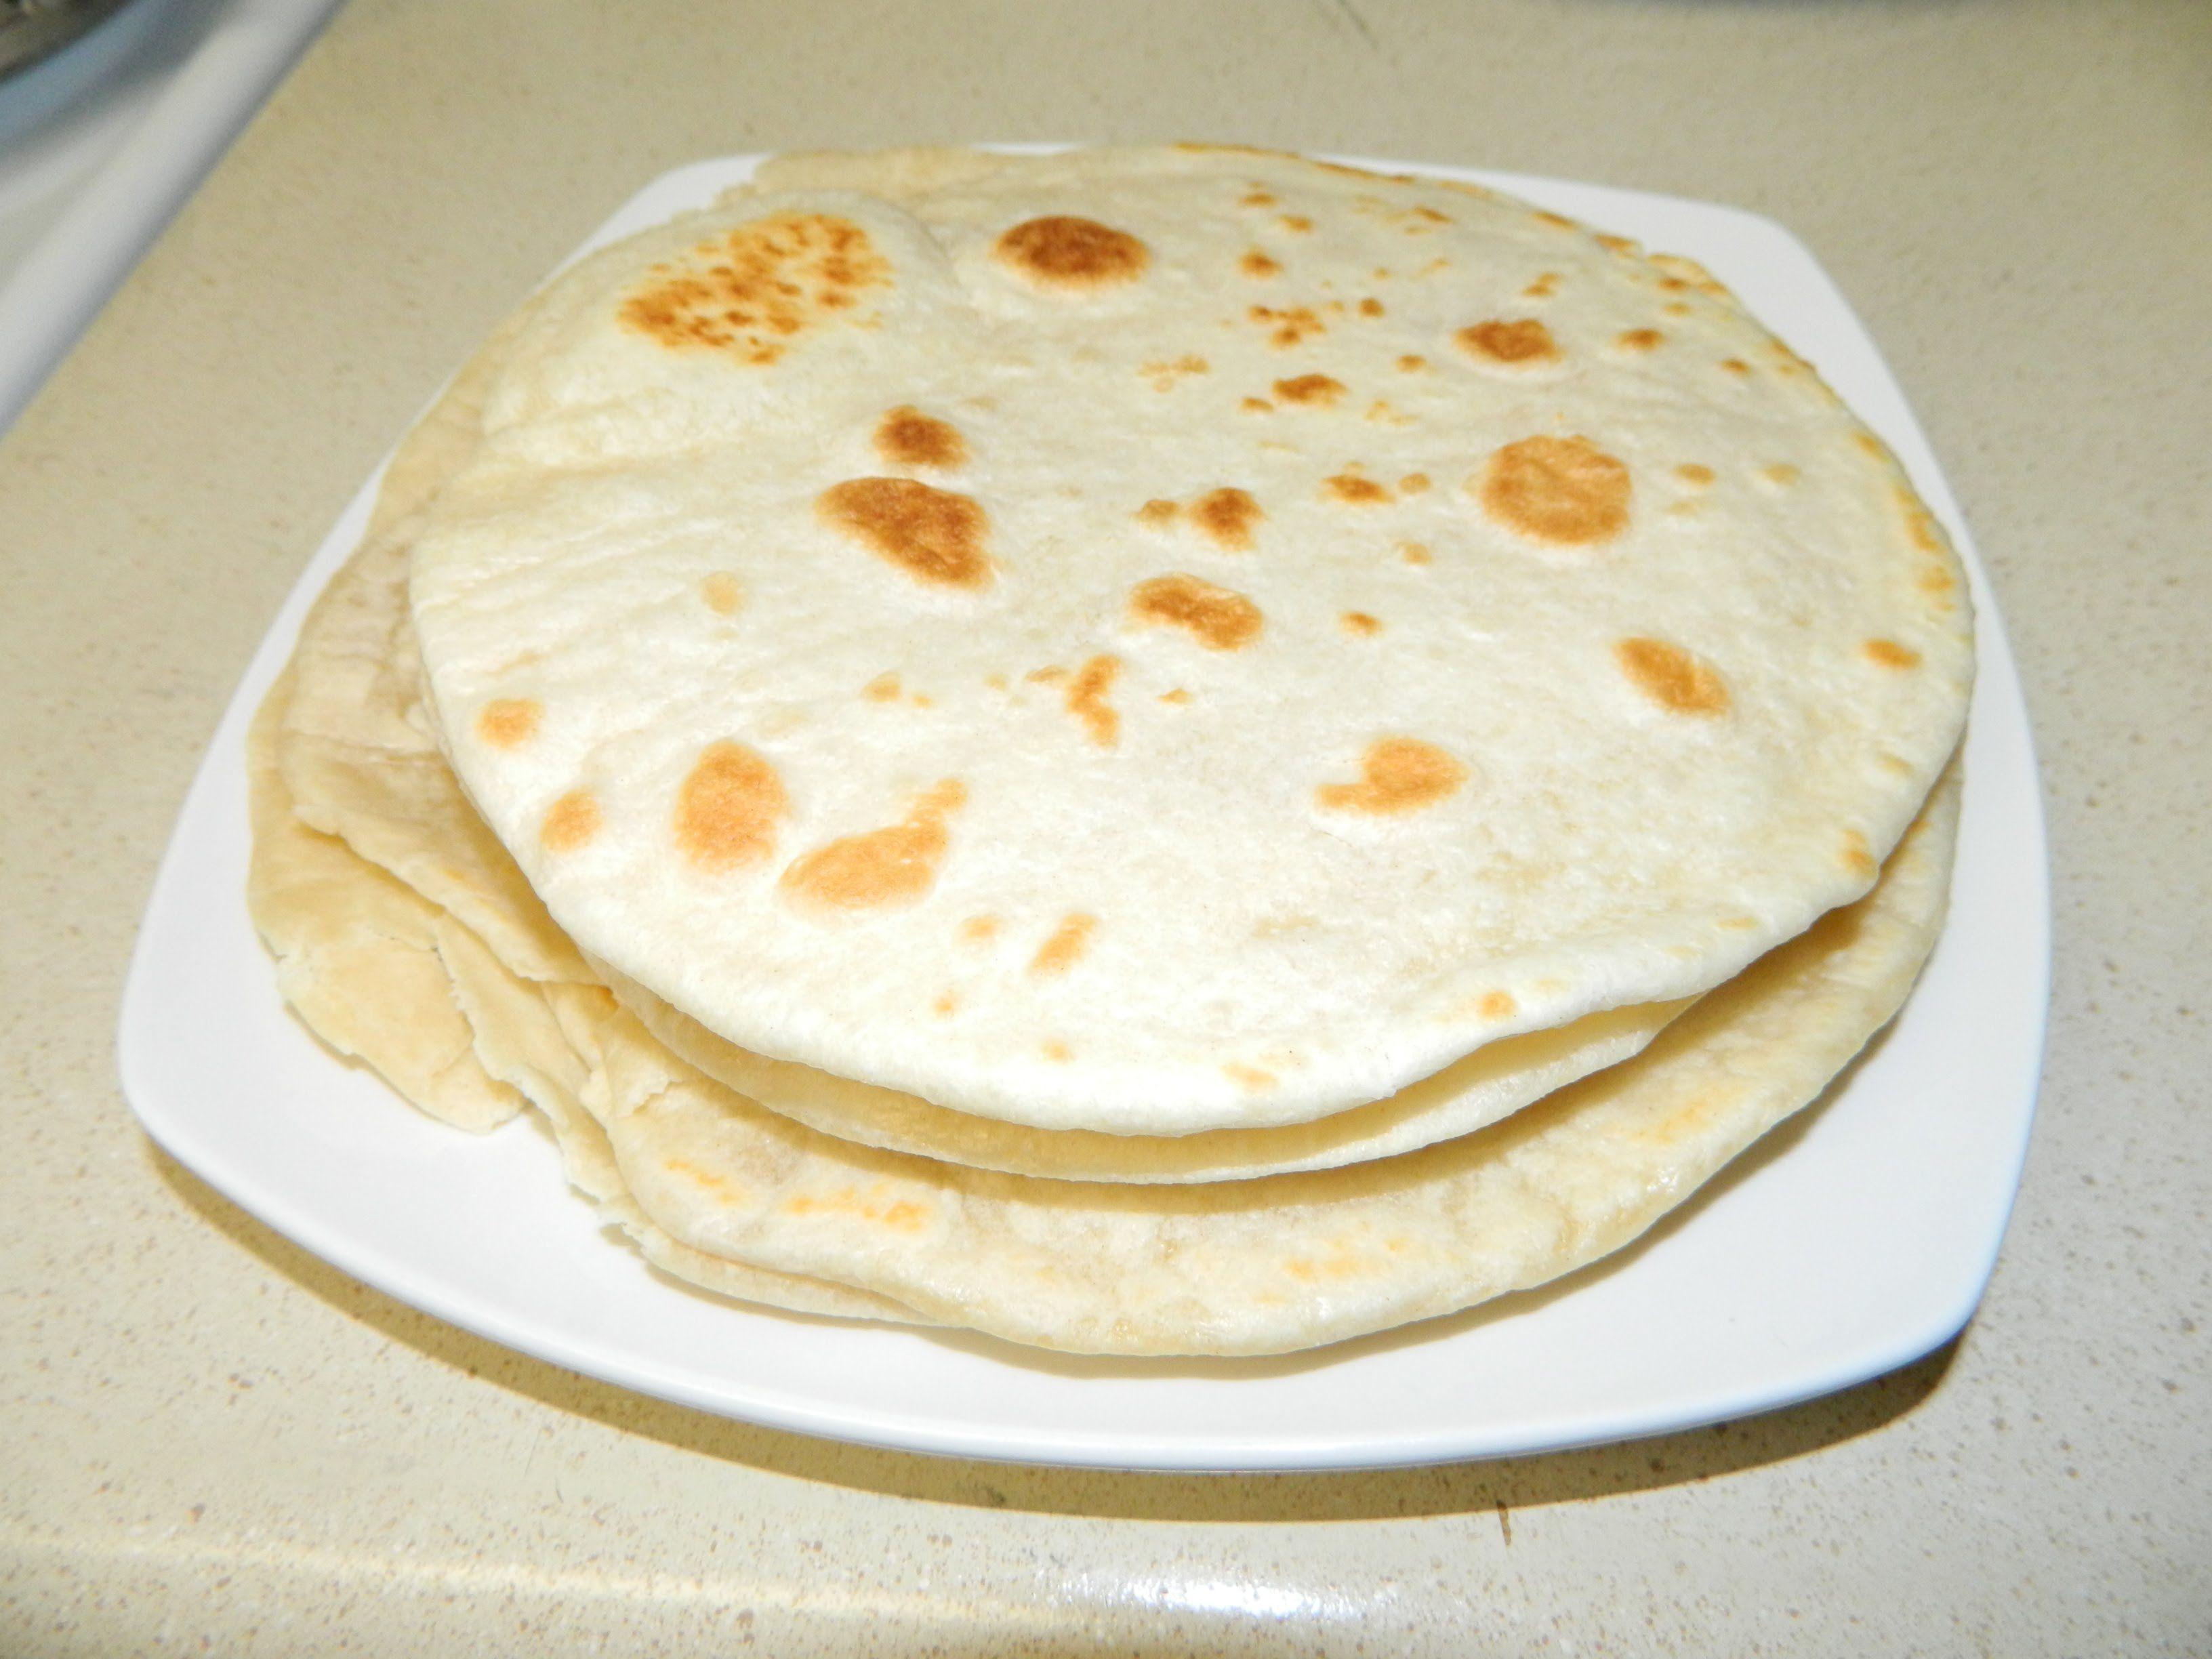 Tortillas de harina para negocio comida para semana - Sartenes para tortilla ...